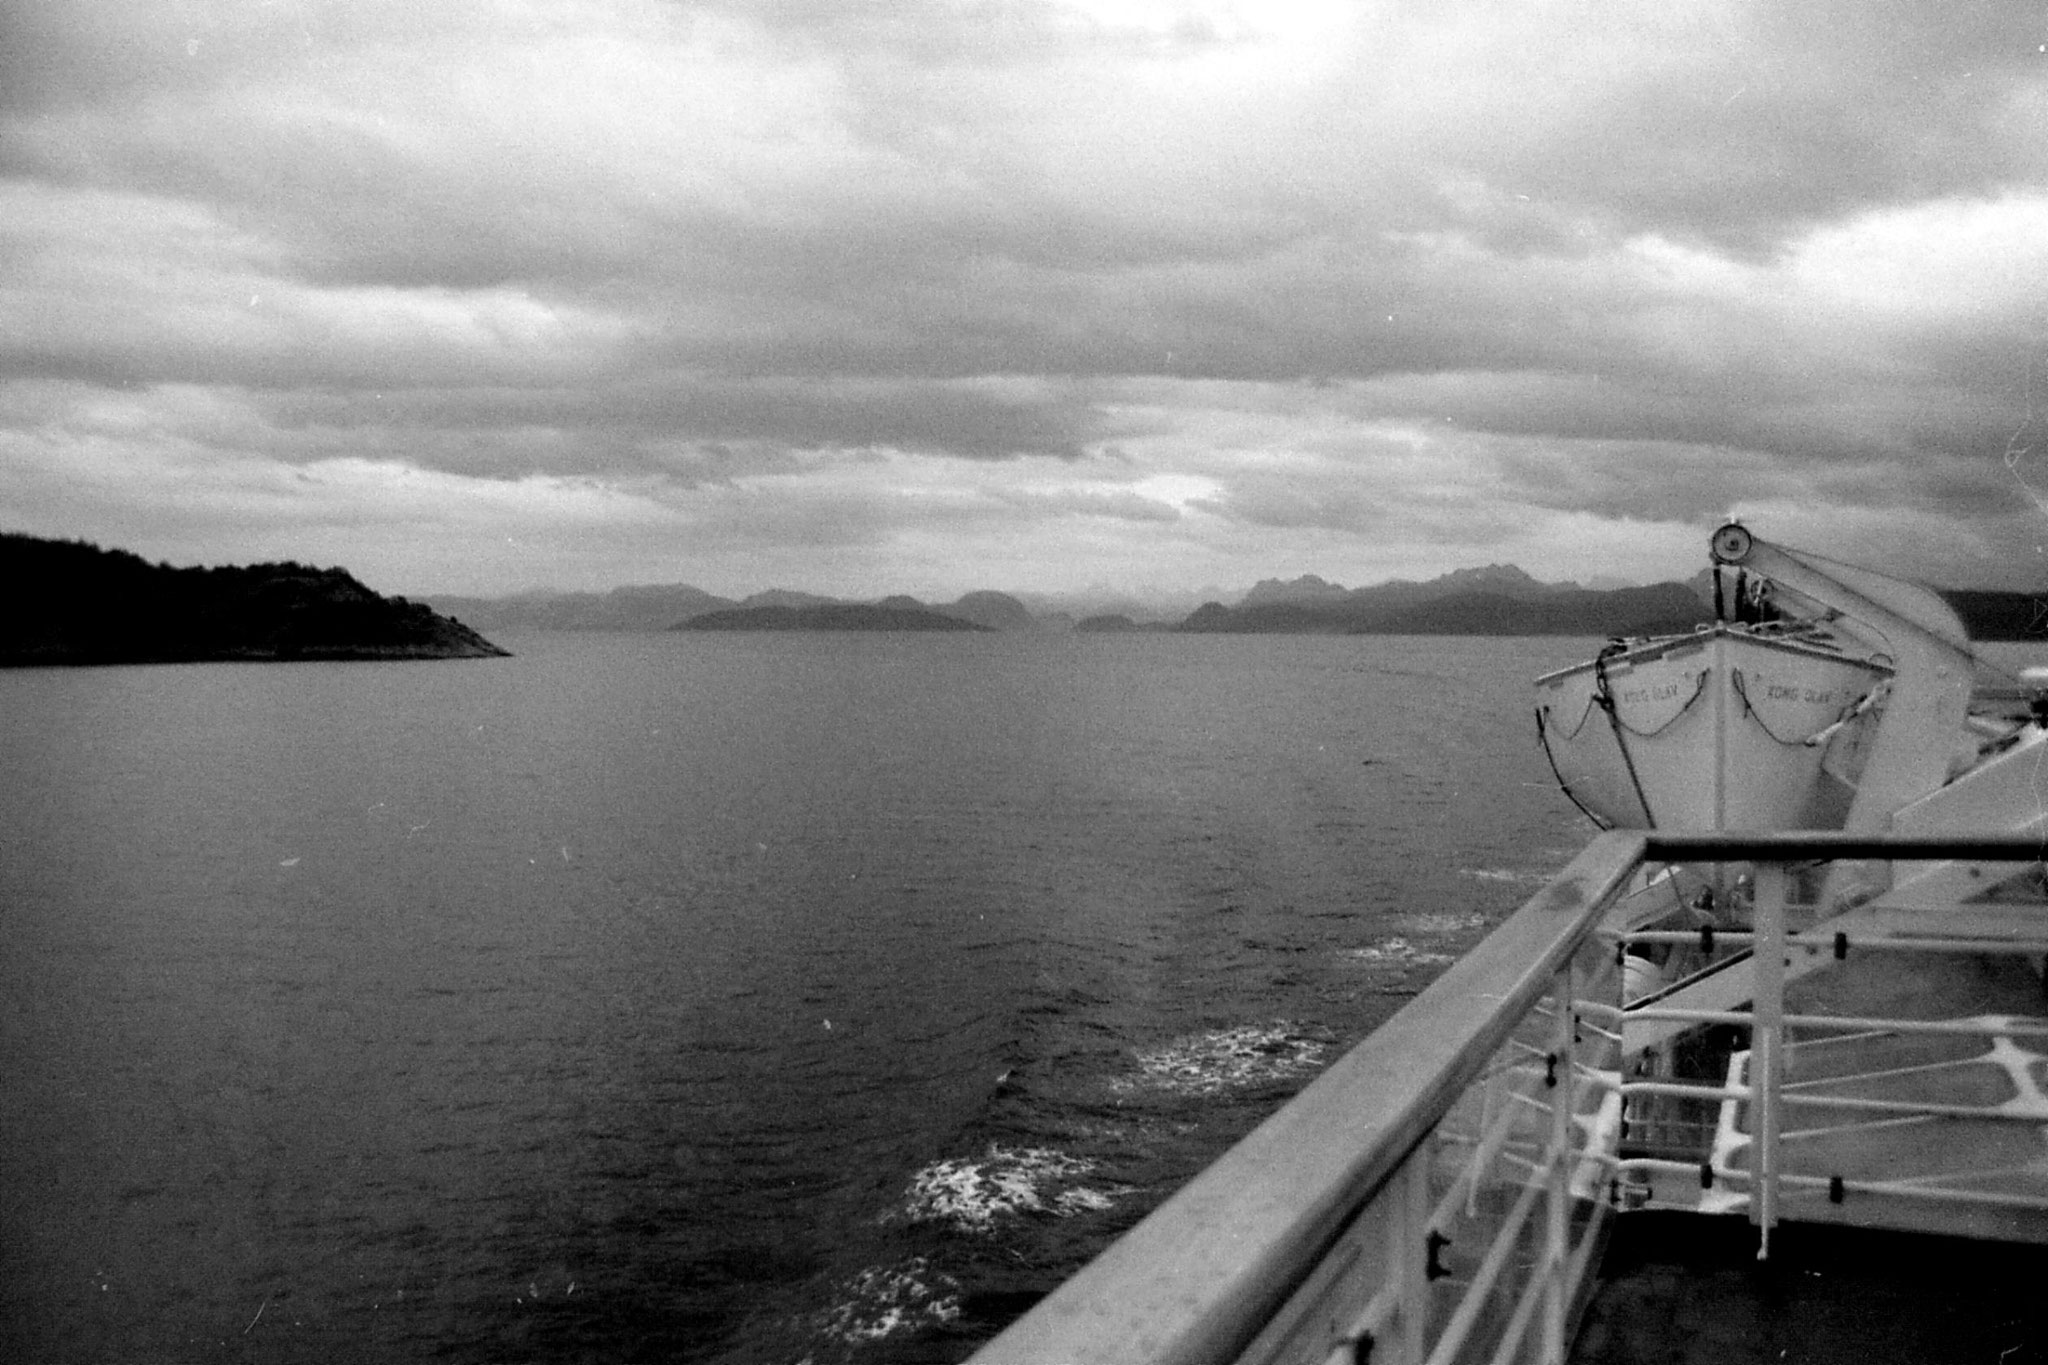 22/9/1988: 4: leaving Molde, Romsdal mountains